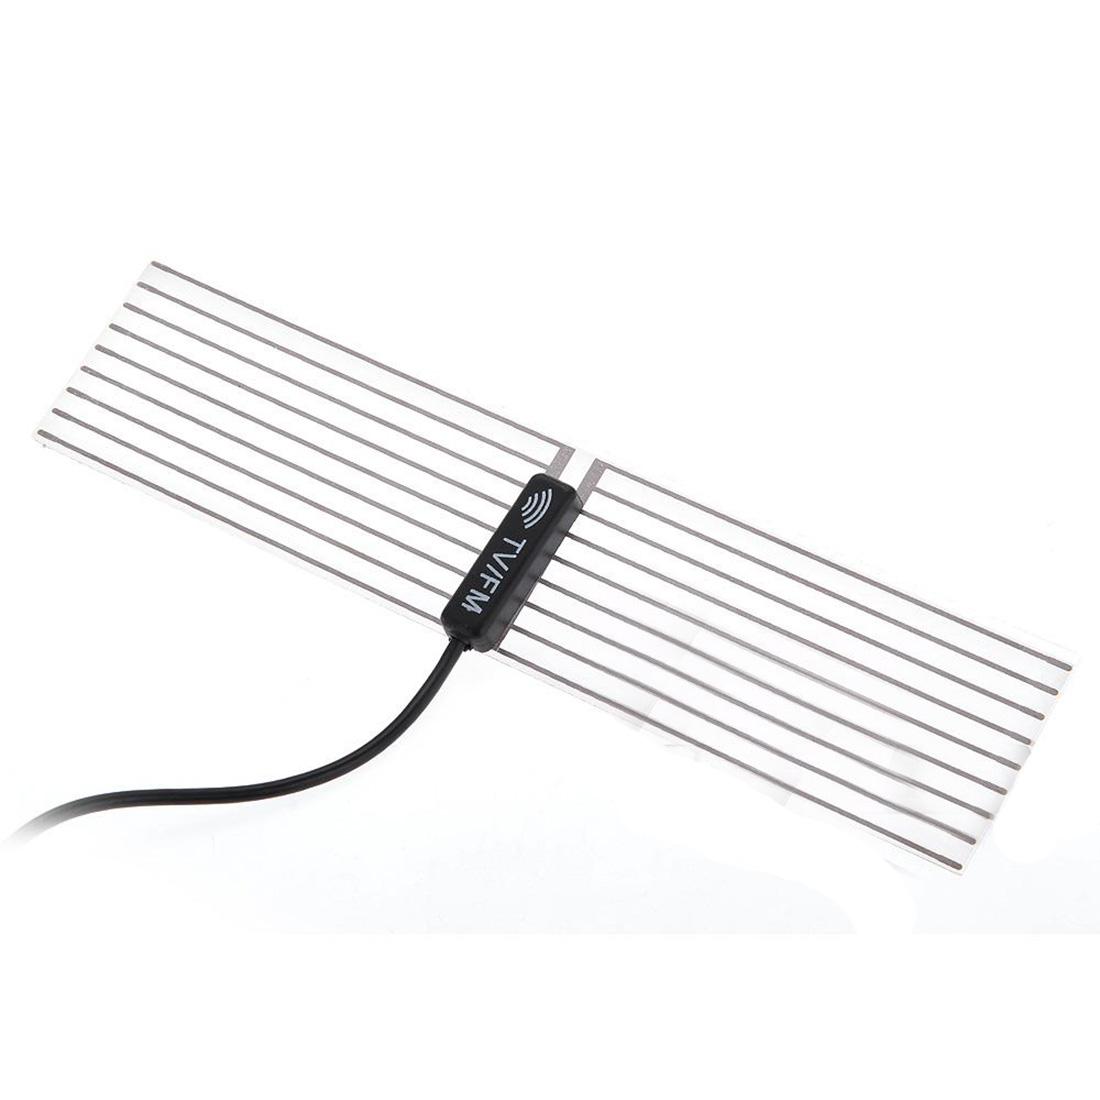 Auto Car DVB-T Digital TV Antenna Aerial Replacement Black PVC Portable<br><br>Aliexpress